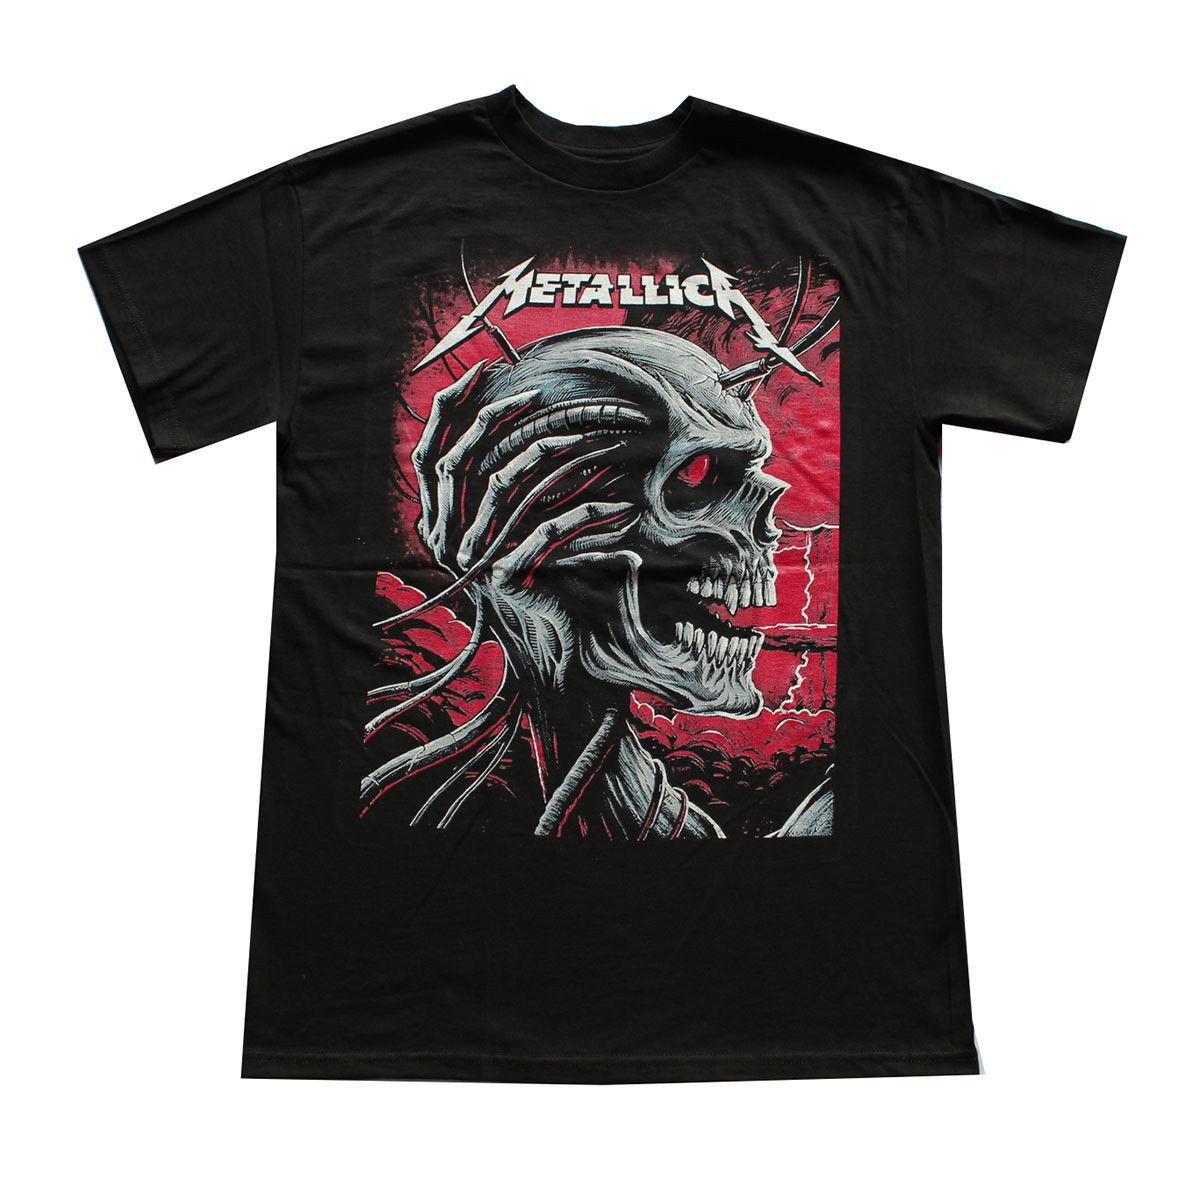 METTALICA Men's T-shirt Black SKULL  New Men'S Fashion Short-Sleeve T Shirt Mens  Short Sleeve Tops Top Tee